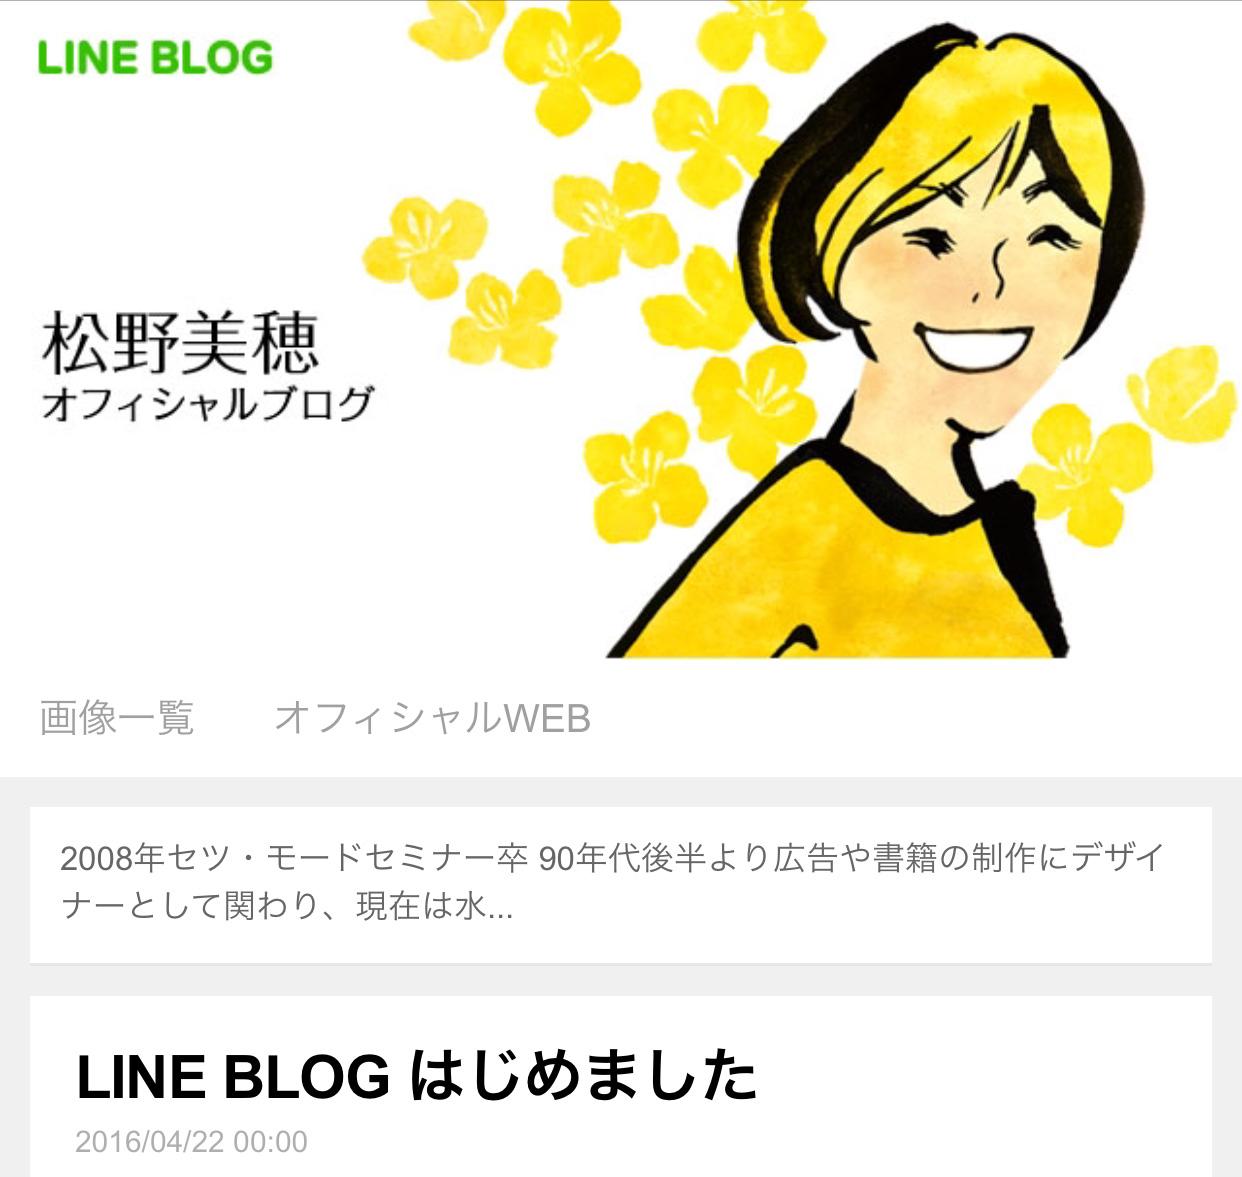 LINE BLOGにオフィシャルブログを開設しました